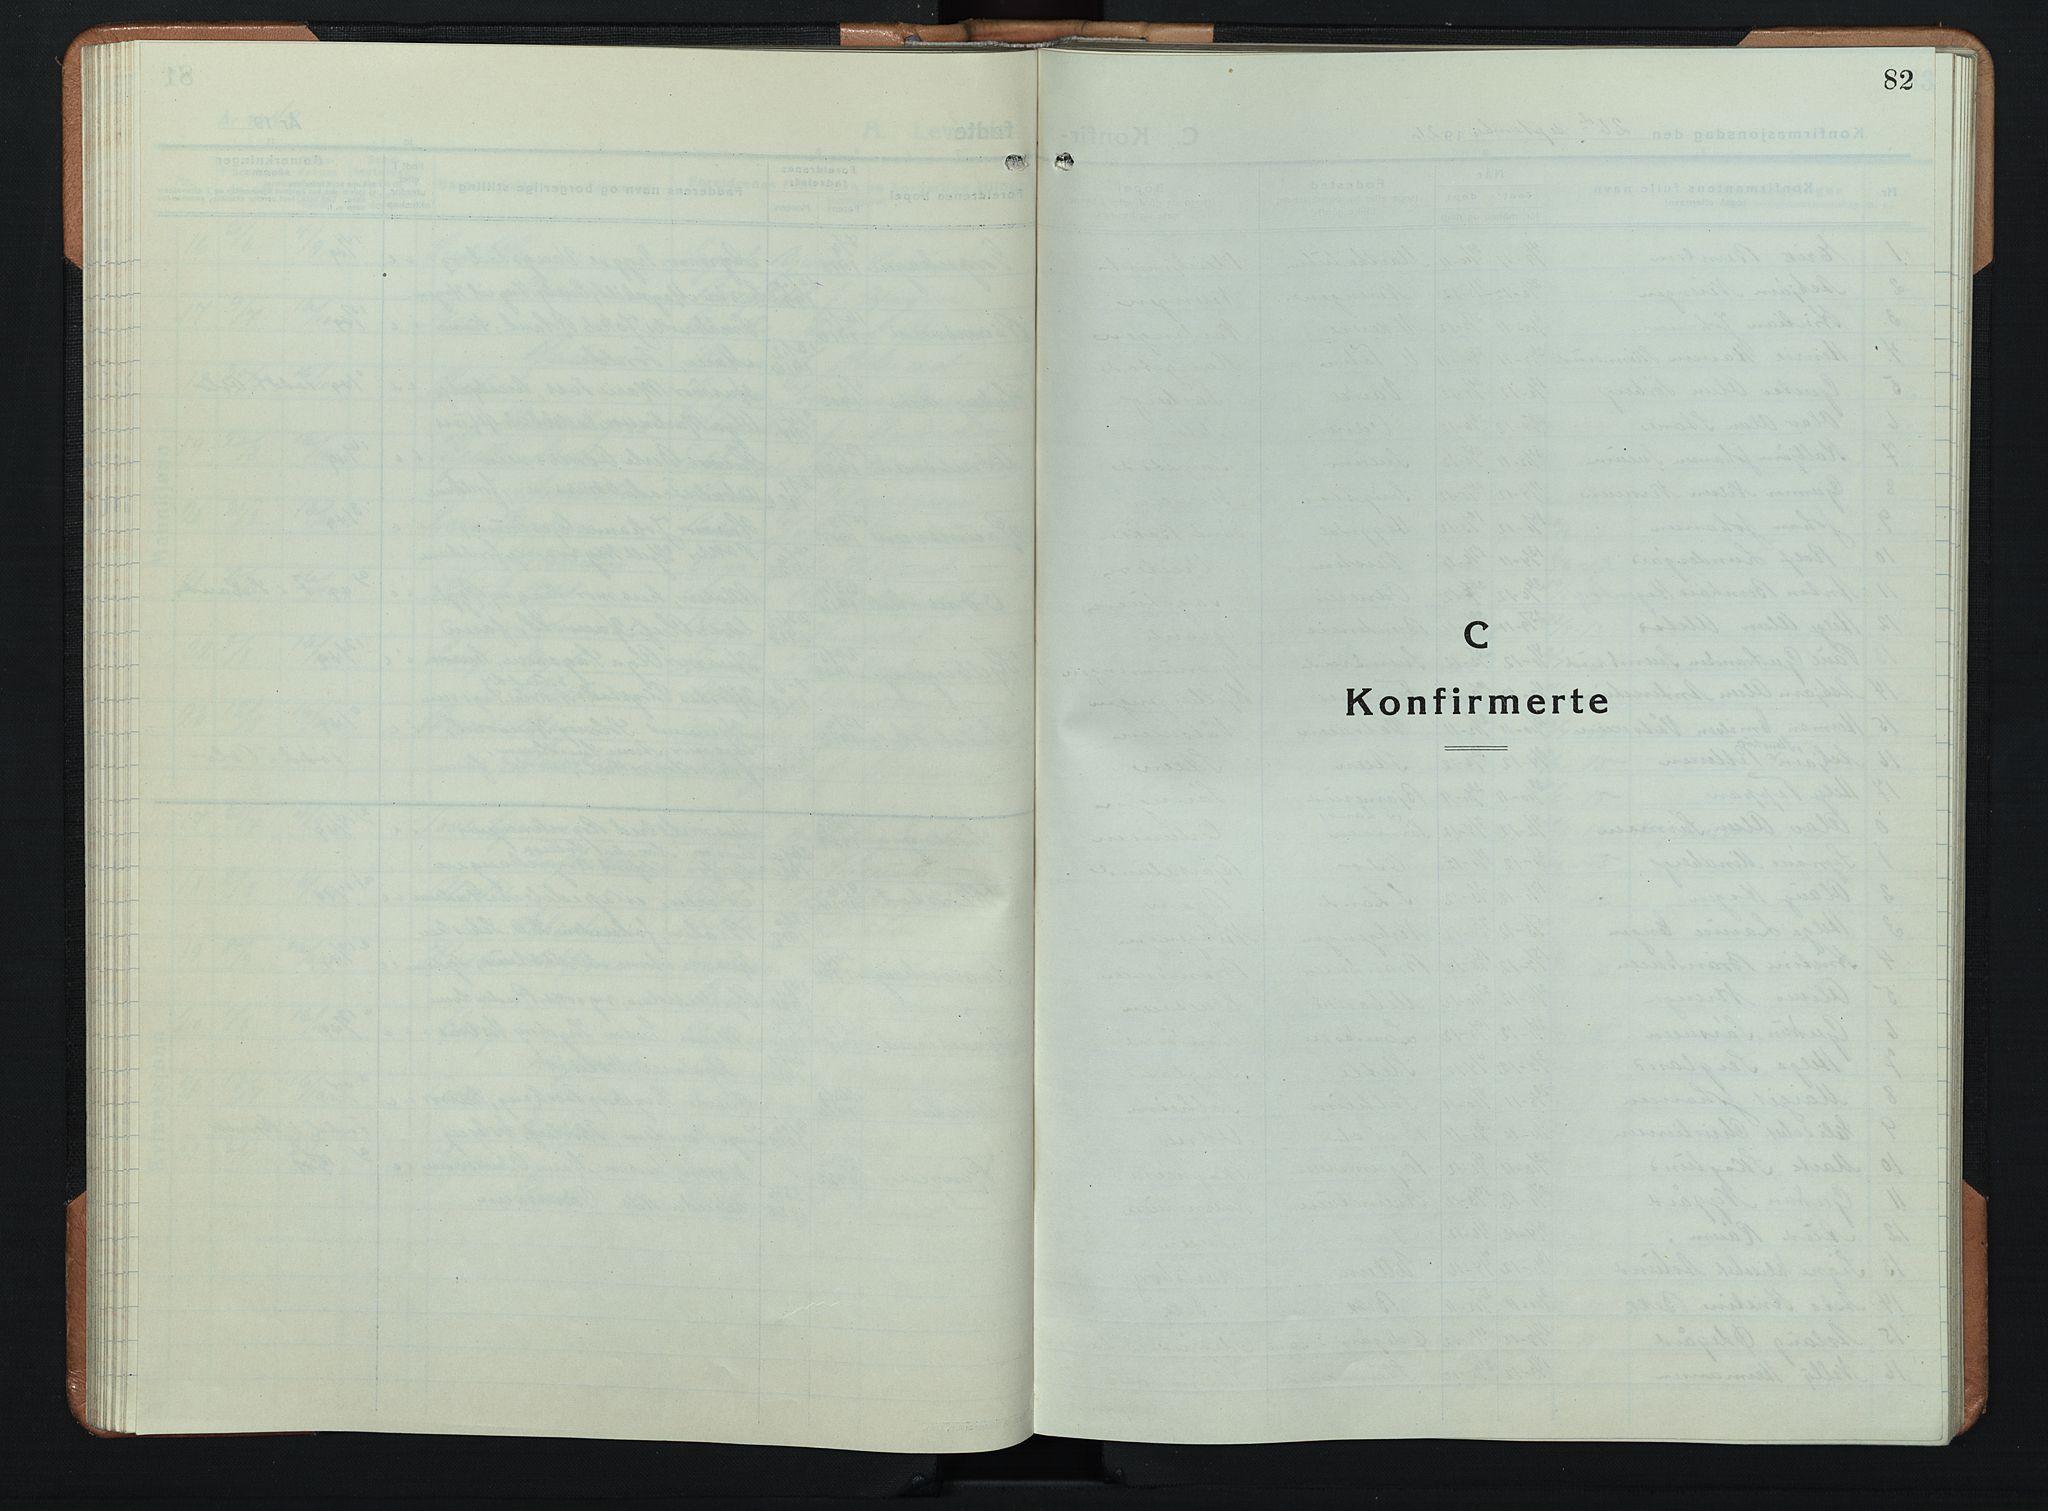 SAH, Søndre Land prestekontor, L/L0008: Klokkerbok nr. 8, 1926-1950, s. 82